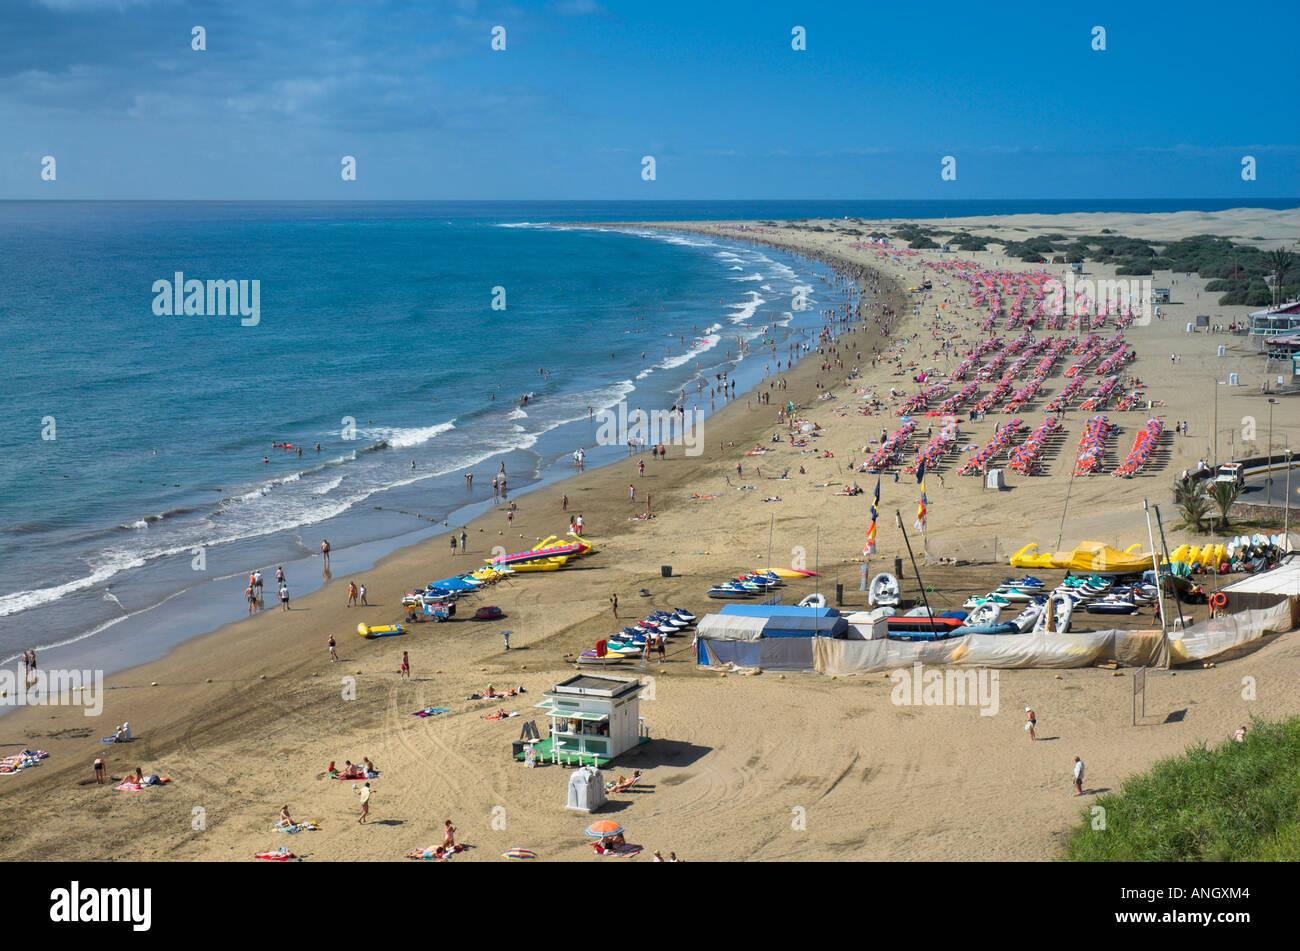 Playa del Ingles, Gran Canaria, Kanarische Inseln, Spanien Stockbild